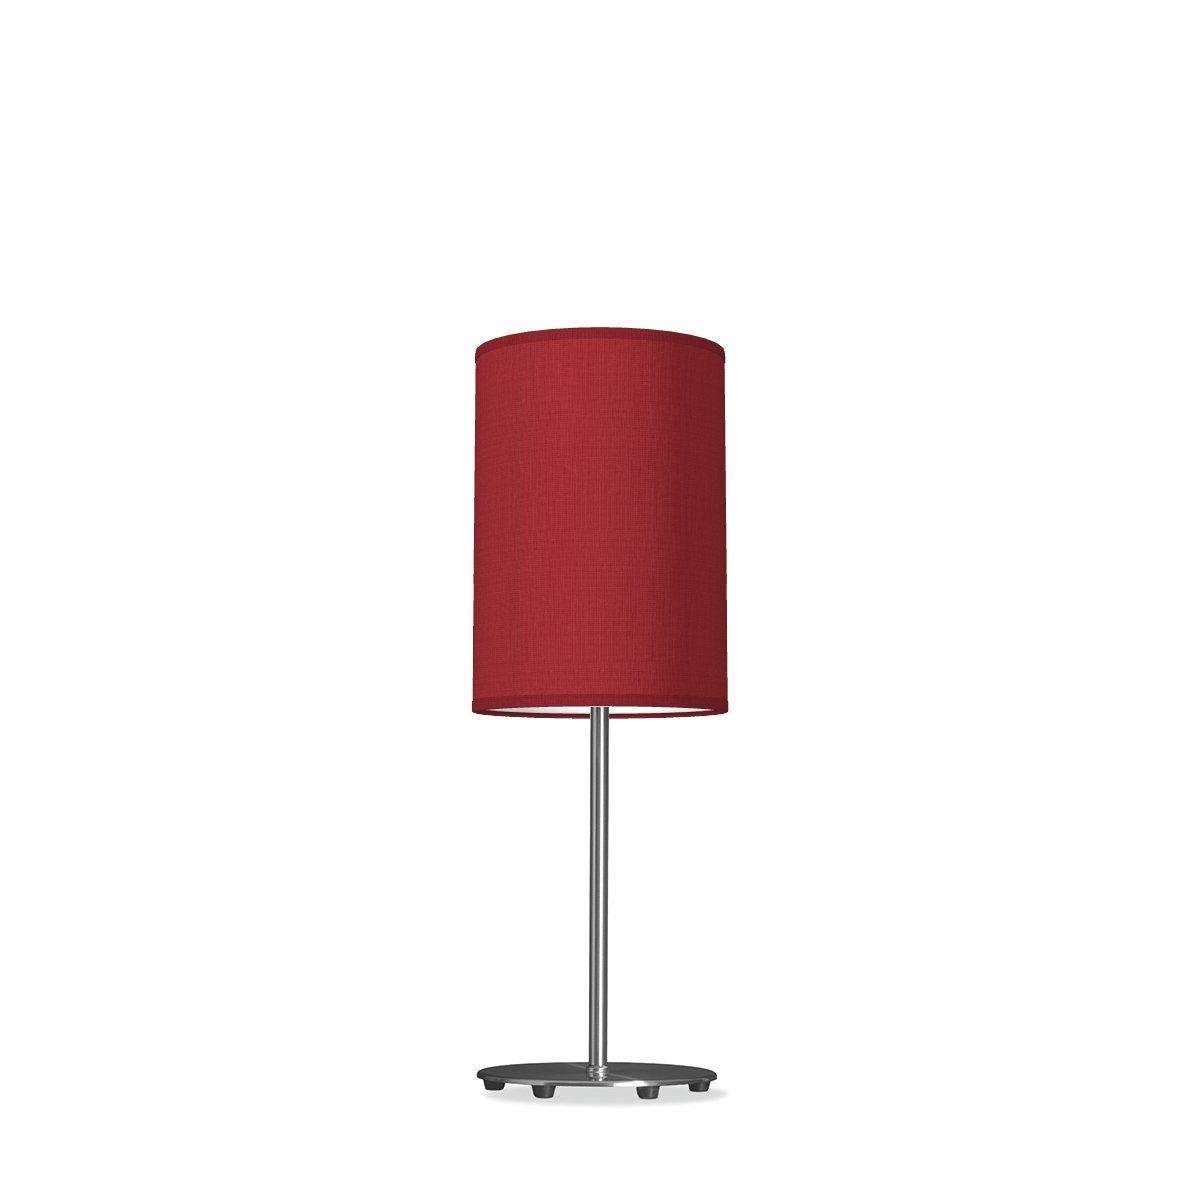 tafellamp lift tube Ø 20 cm - rood